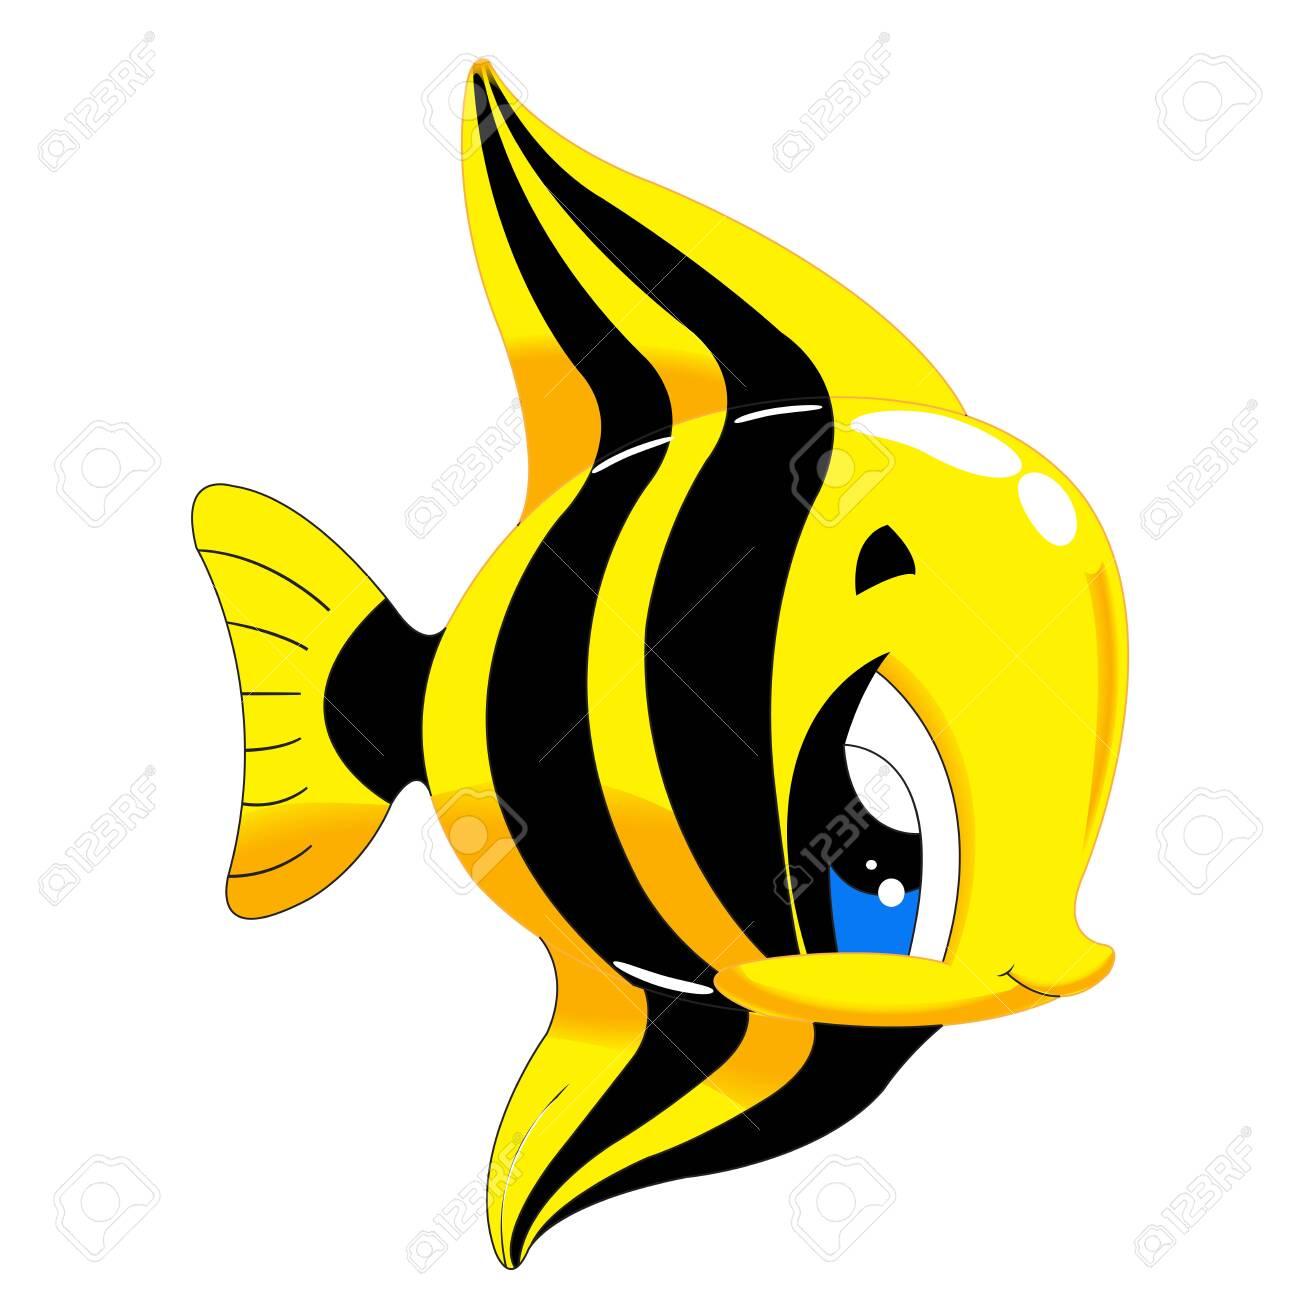 Sea Animal Clipart - Cute Under Sea Animals Cartoon - Png Download  (#5332613) - PinClipart